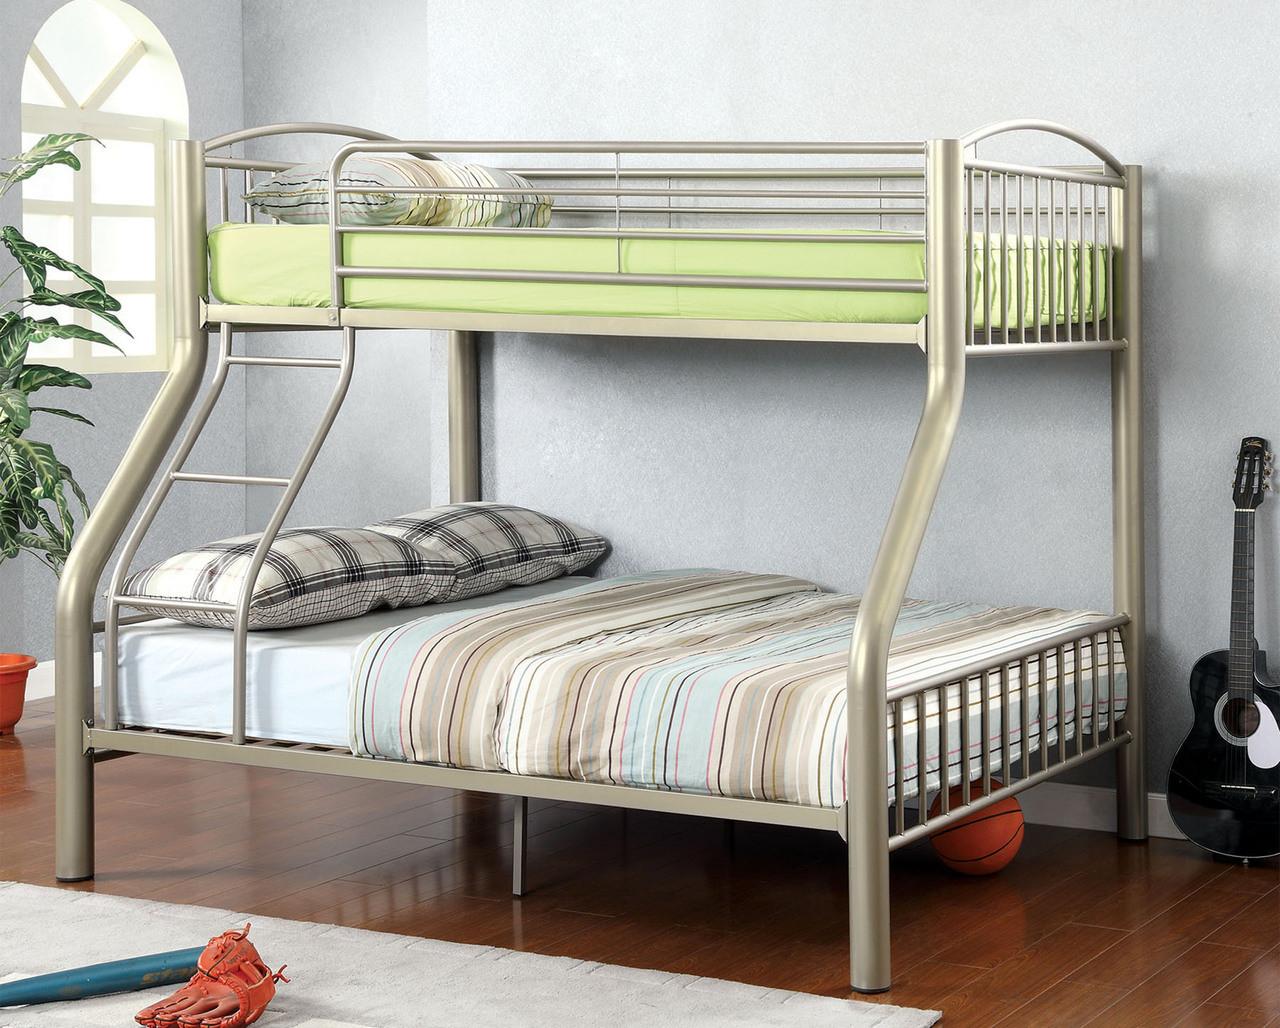 Paddington Metallic Gold Twin Over Full Metal Bunk Bed